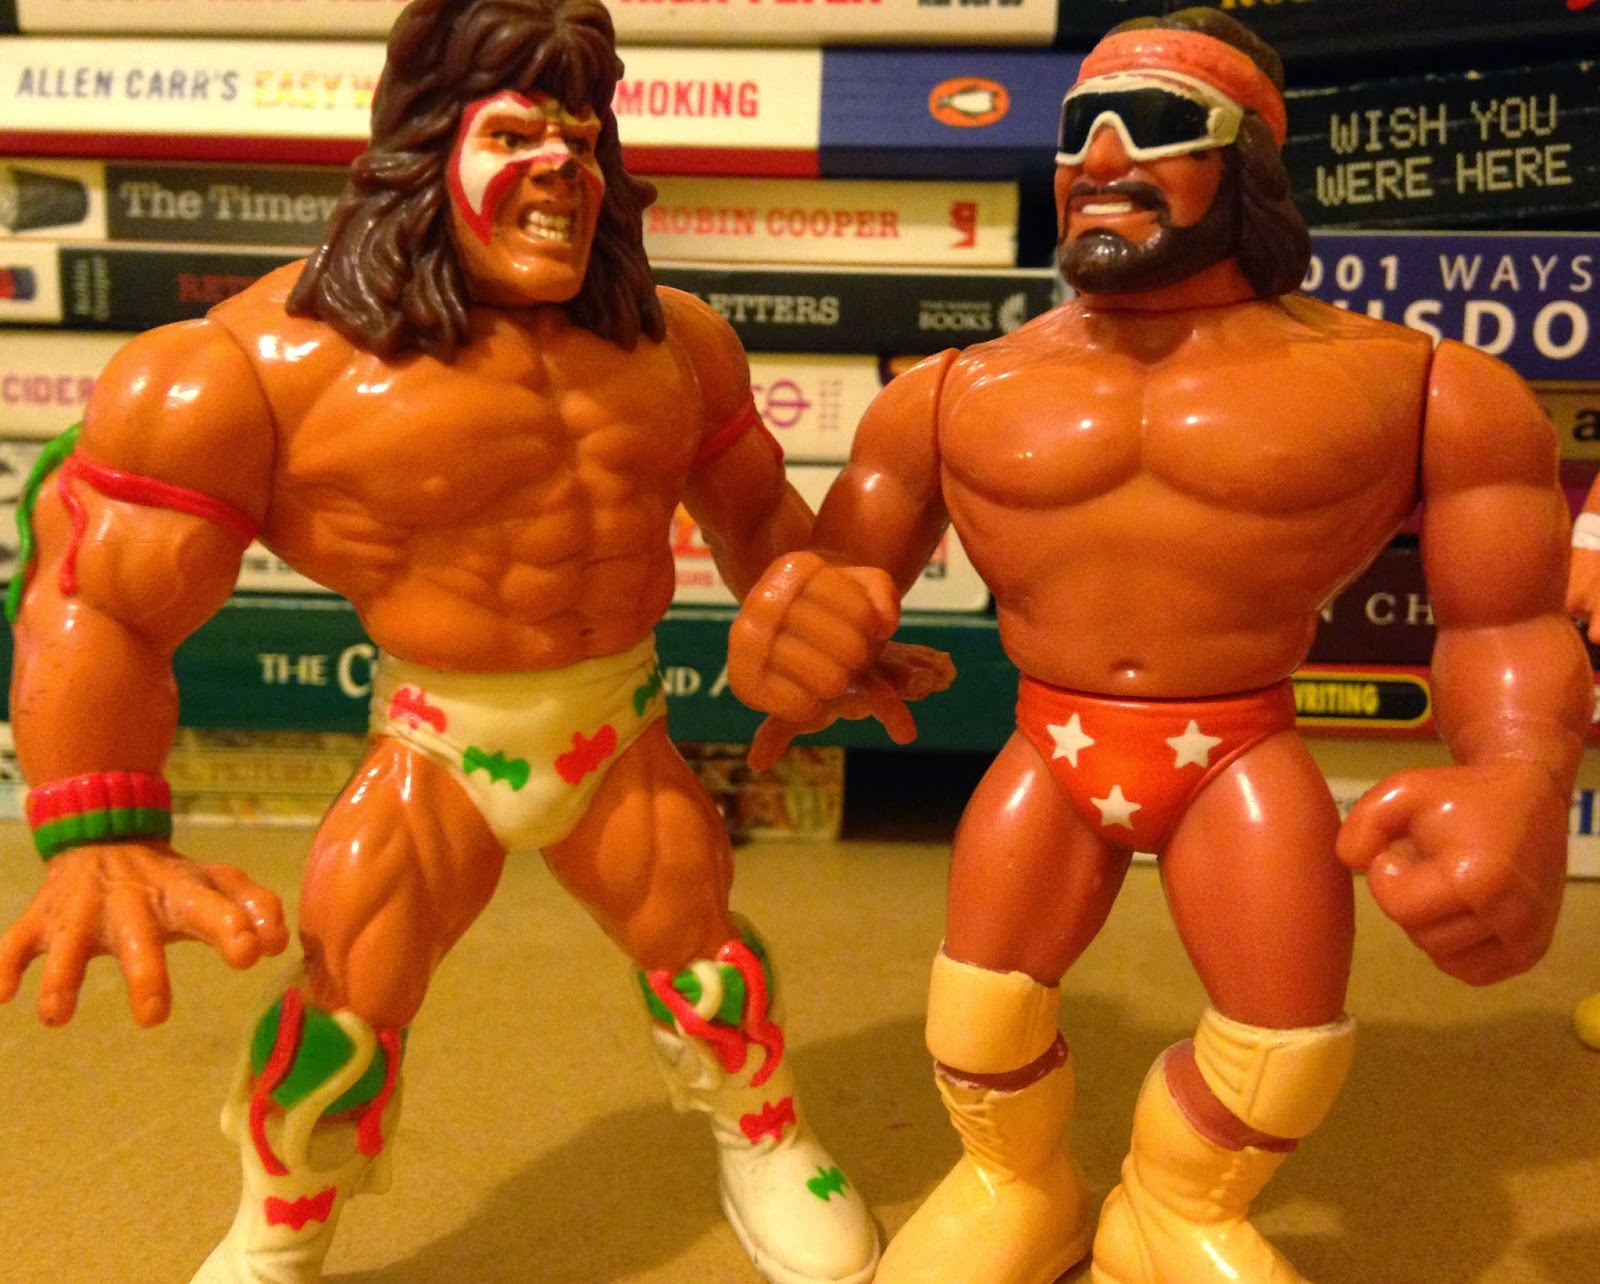 WWF / WWE - Hasbro Wrestling Figures - Macho Man Randy Savage vs.Ultimate Warrior from Wrestlemania 7